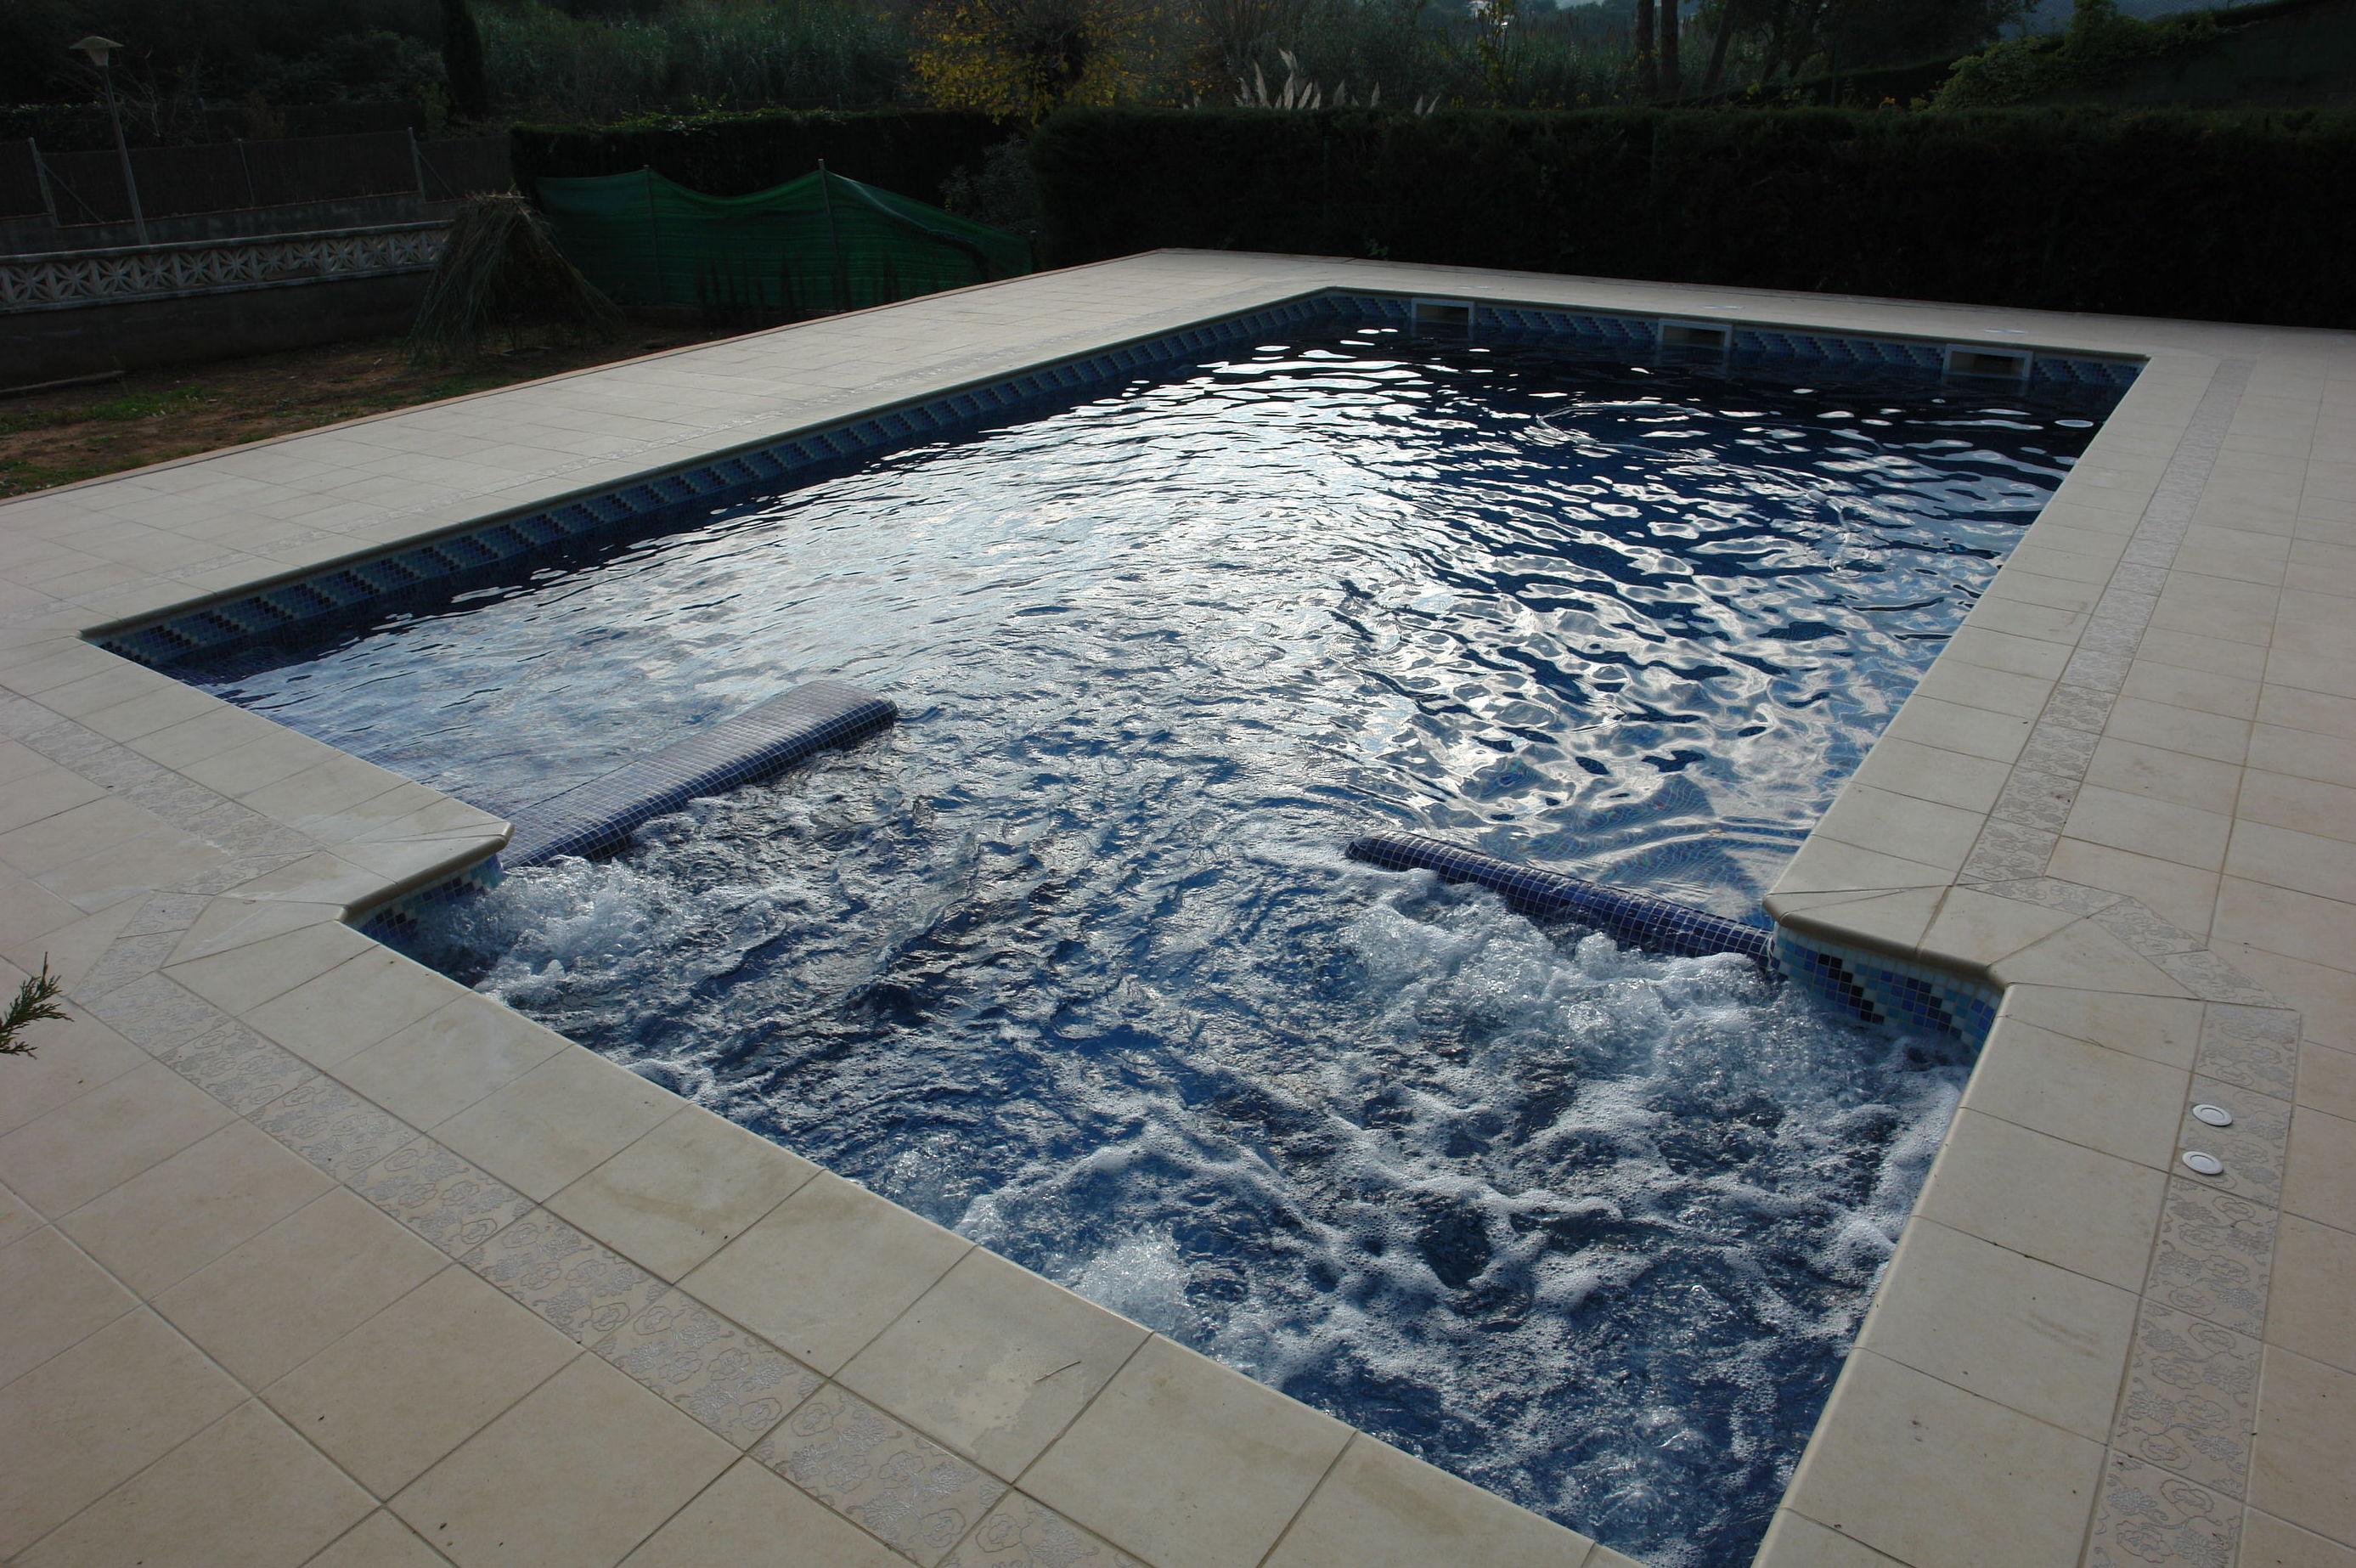 Piscina p blica servicios de aquanet piscinas s l for Piscina publica barcelona